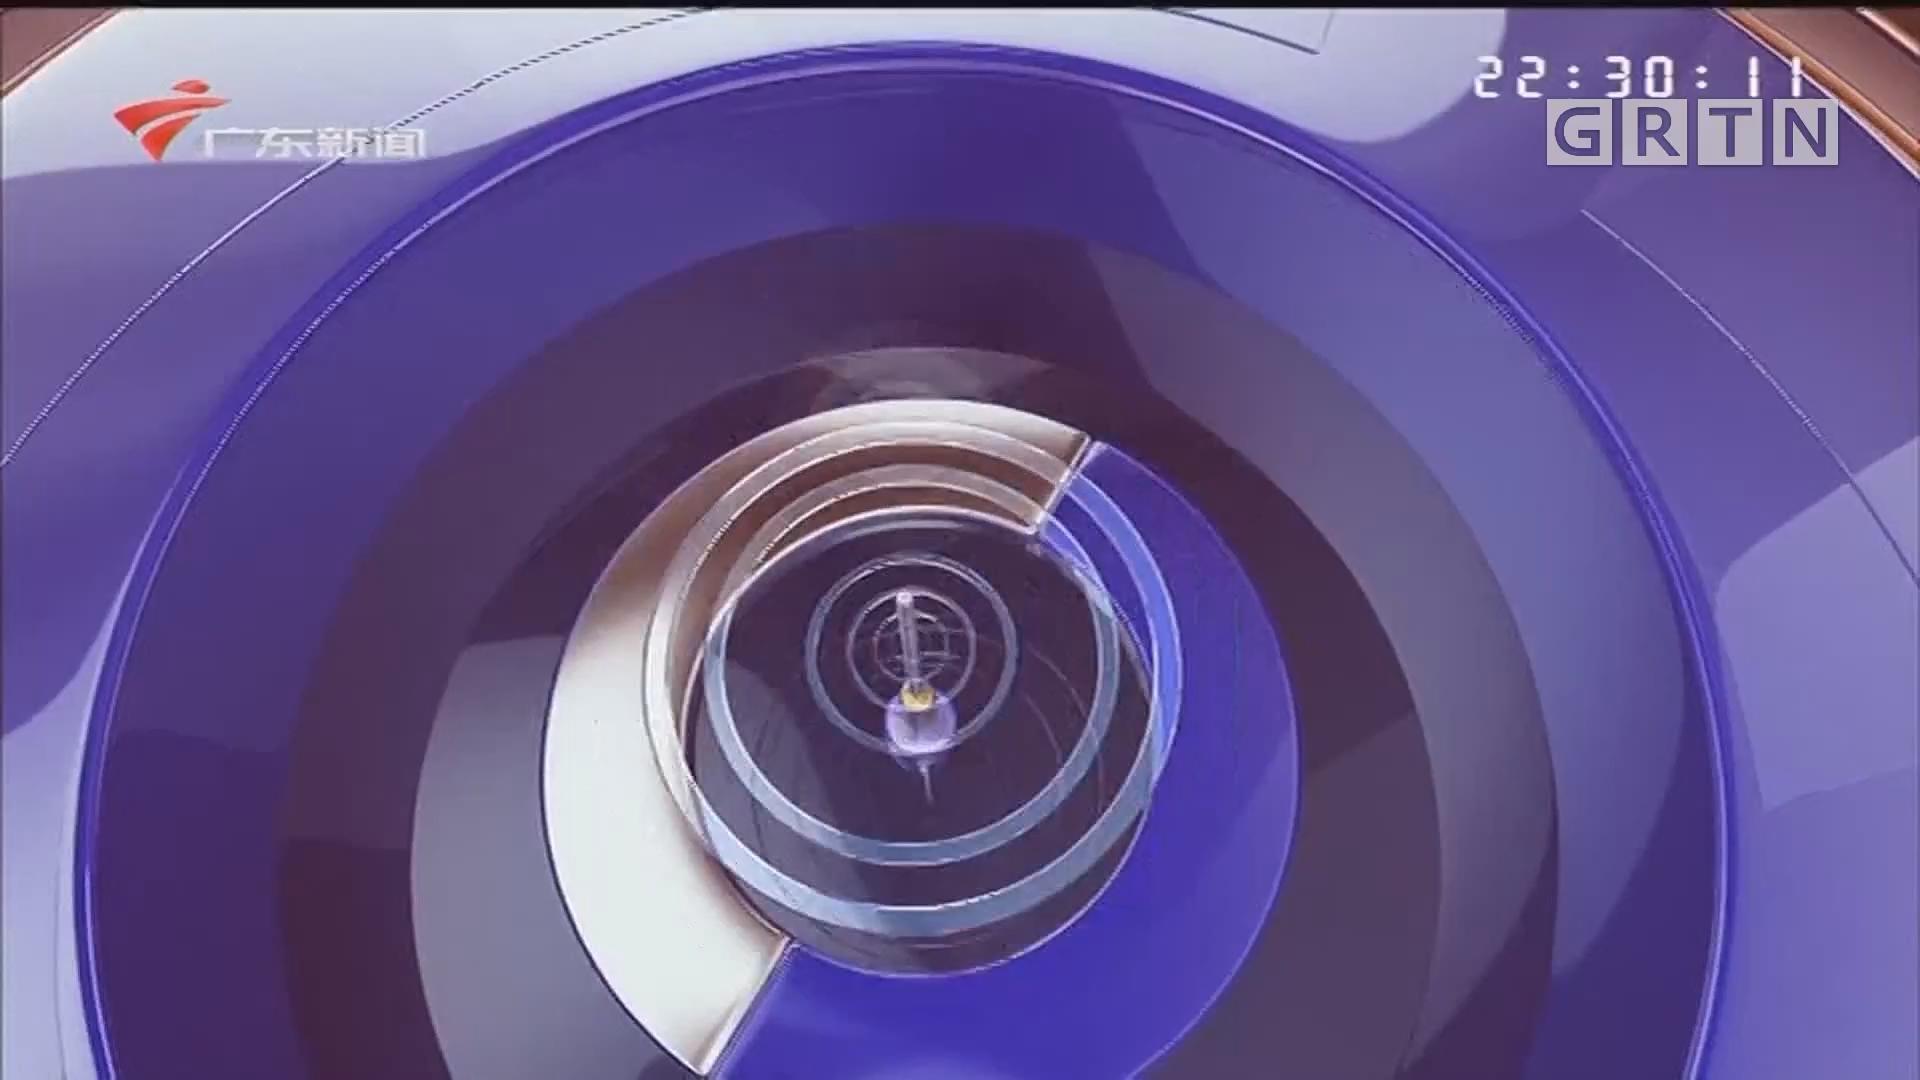 [HD][2019-12-20]新闻夜线:庆祝澳门回归祖国20周年大会暨澳门特别行政区第五届政府就职典礼隆重举行 习近平出席并发表重要讲话